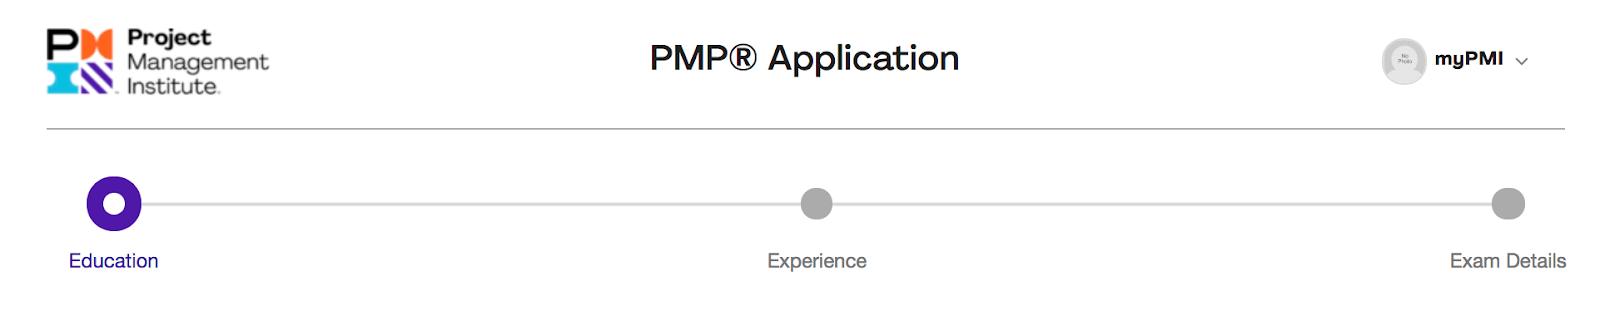 pmp application process